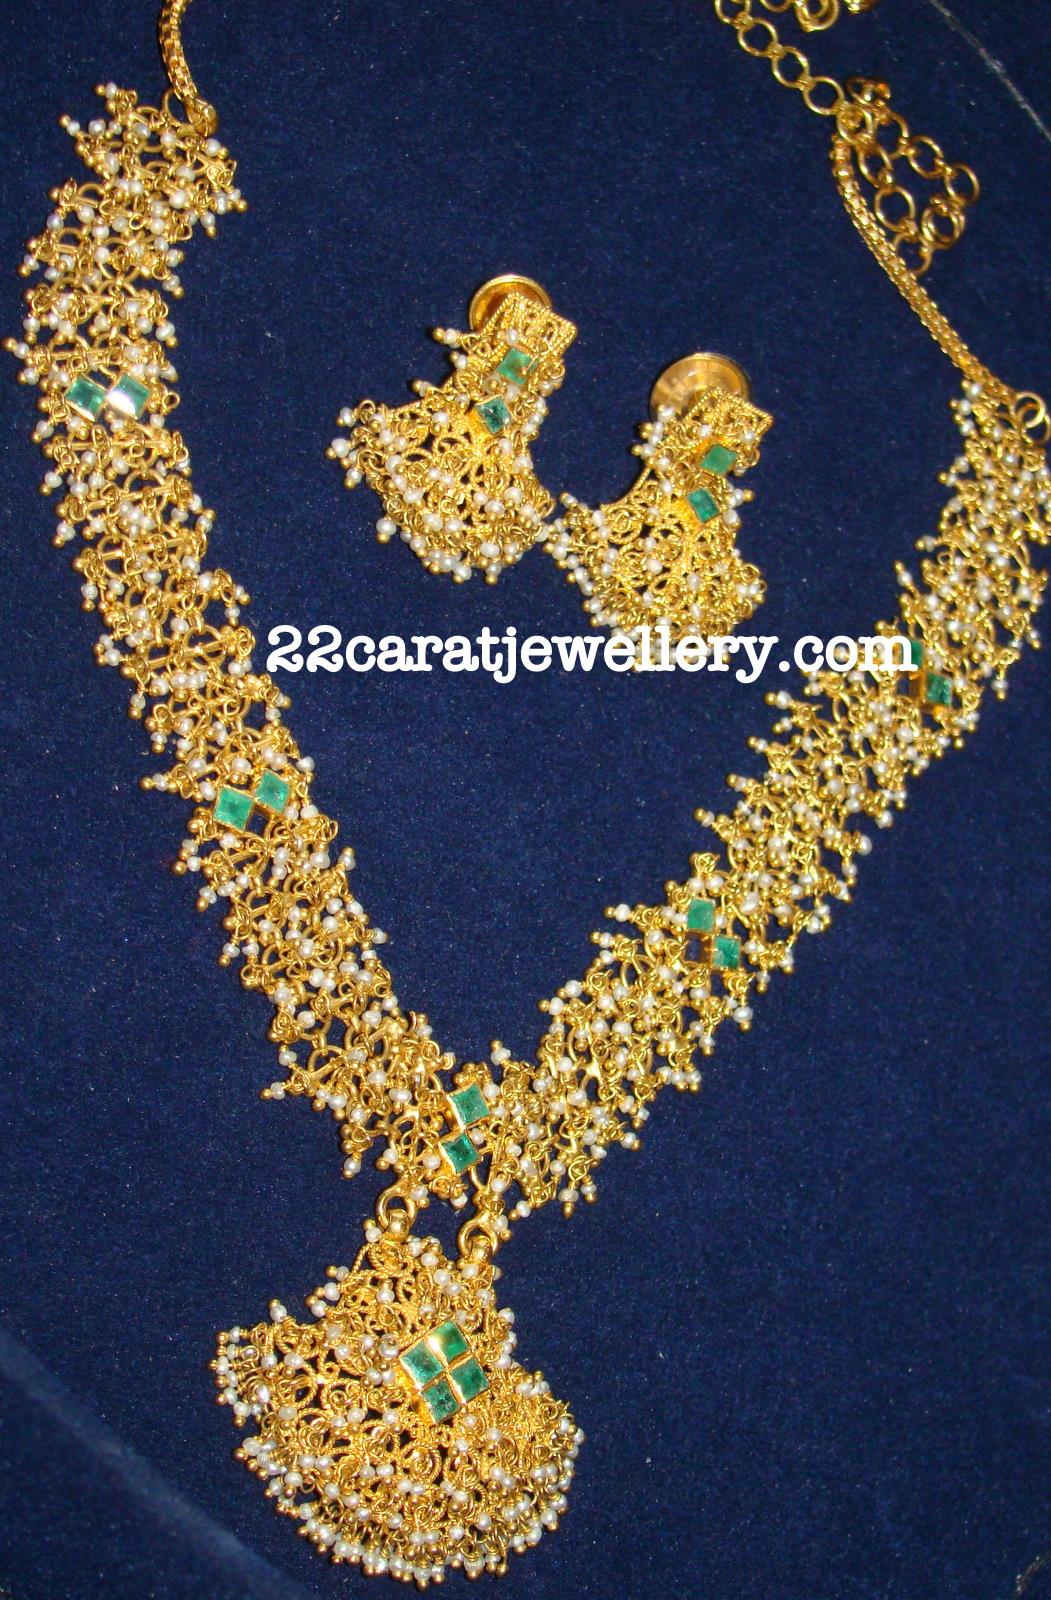 My Basara Pearls Kundan Necklace Set Jewellery Designs